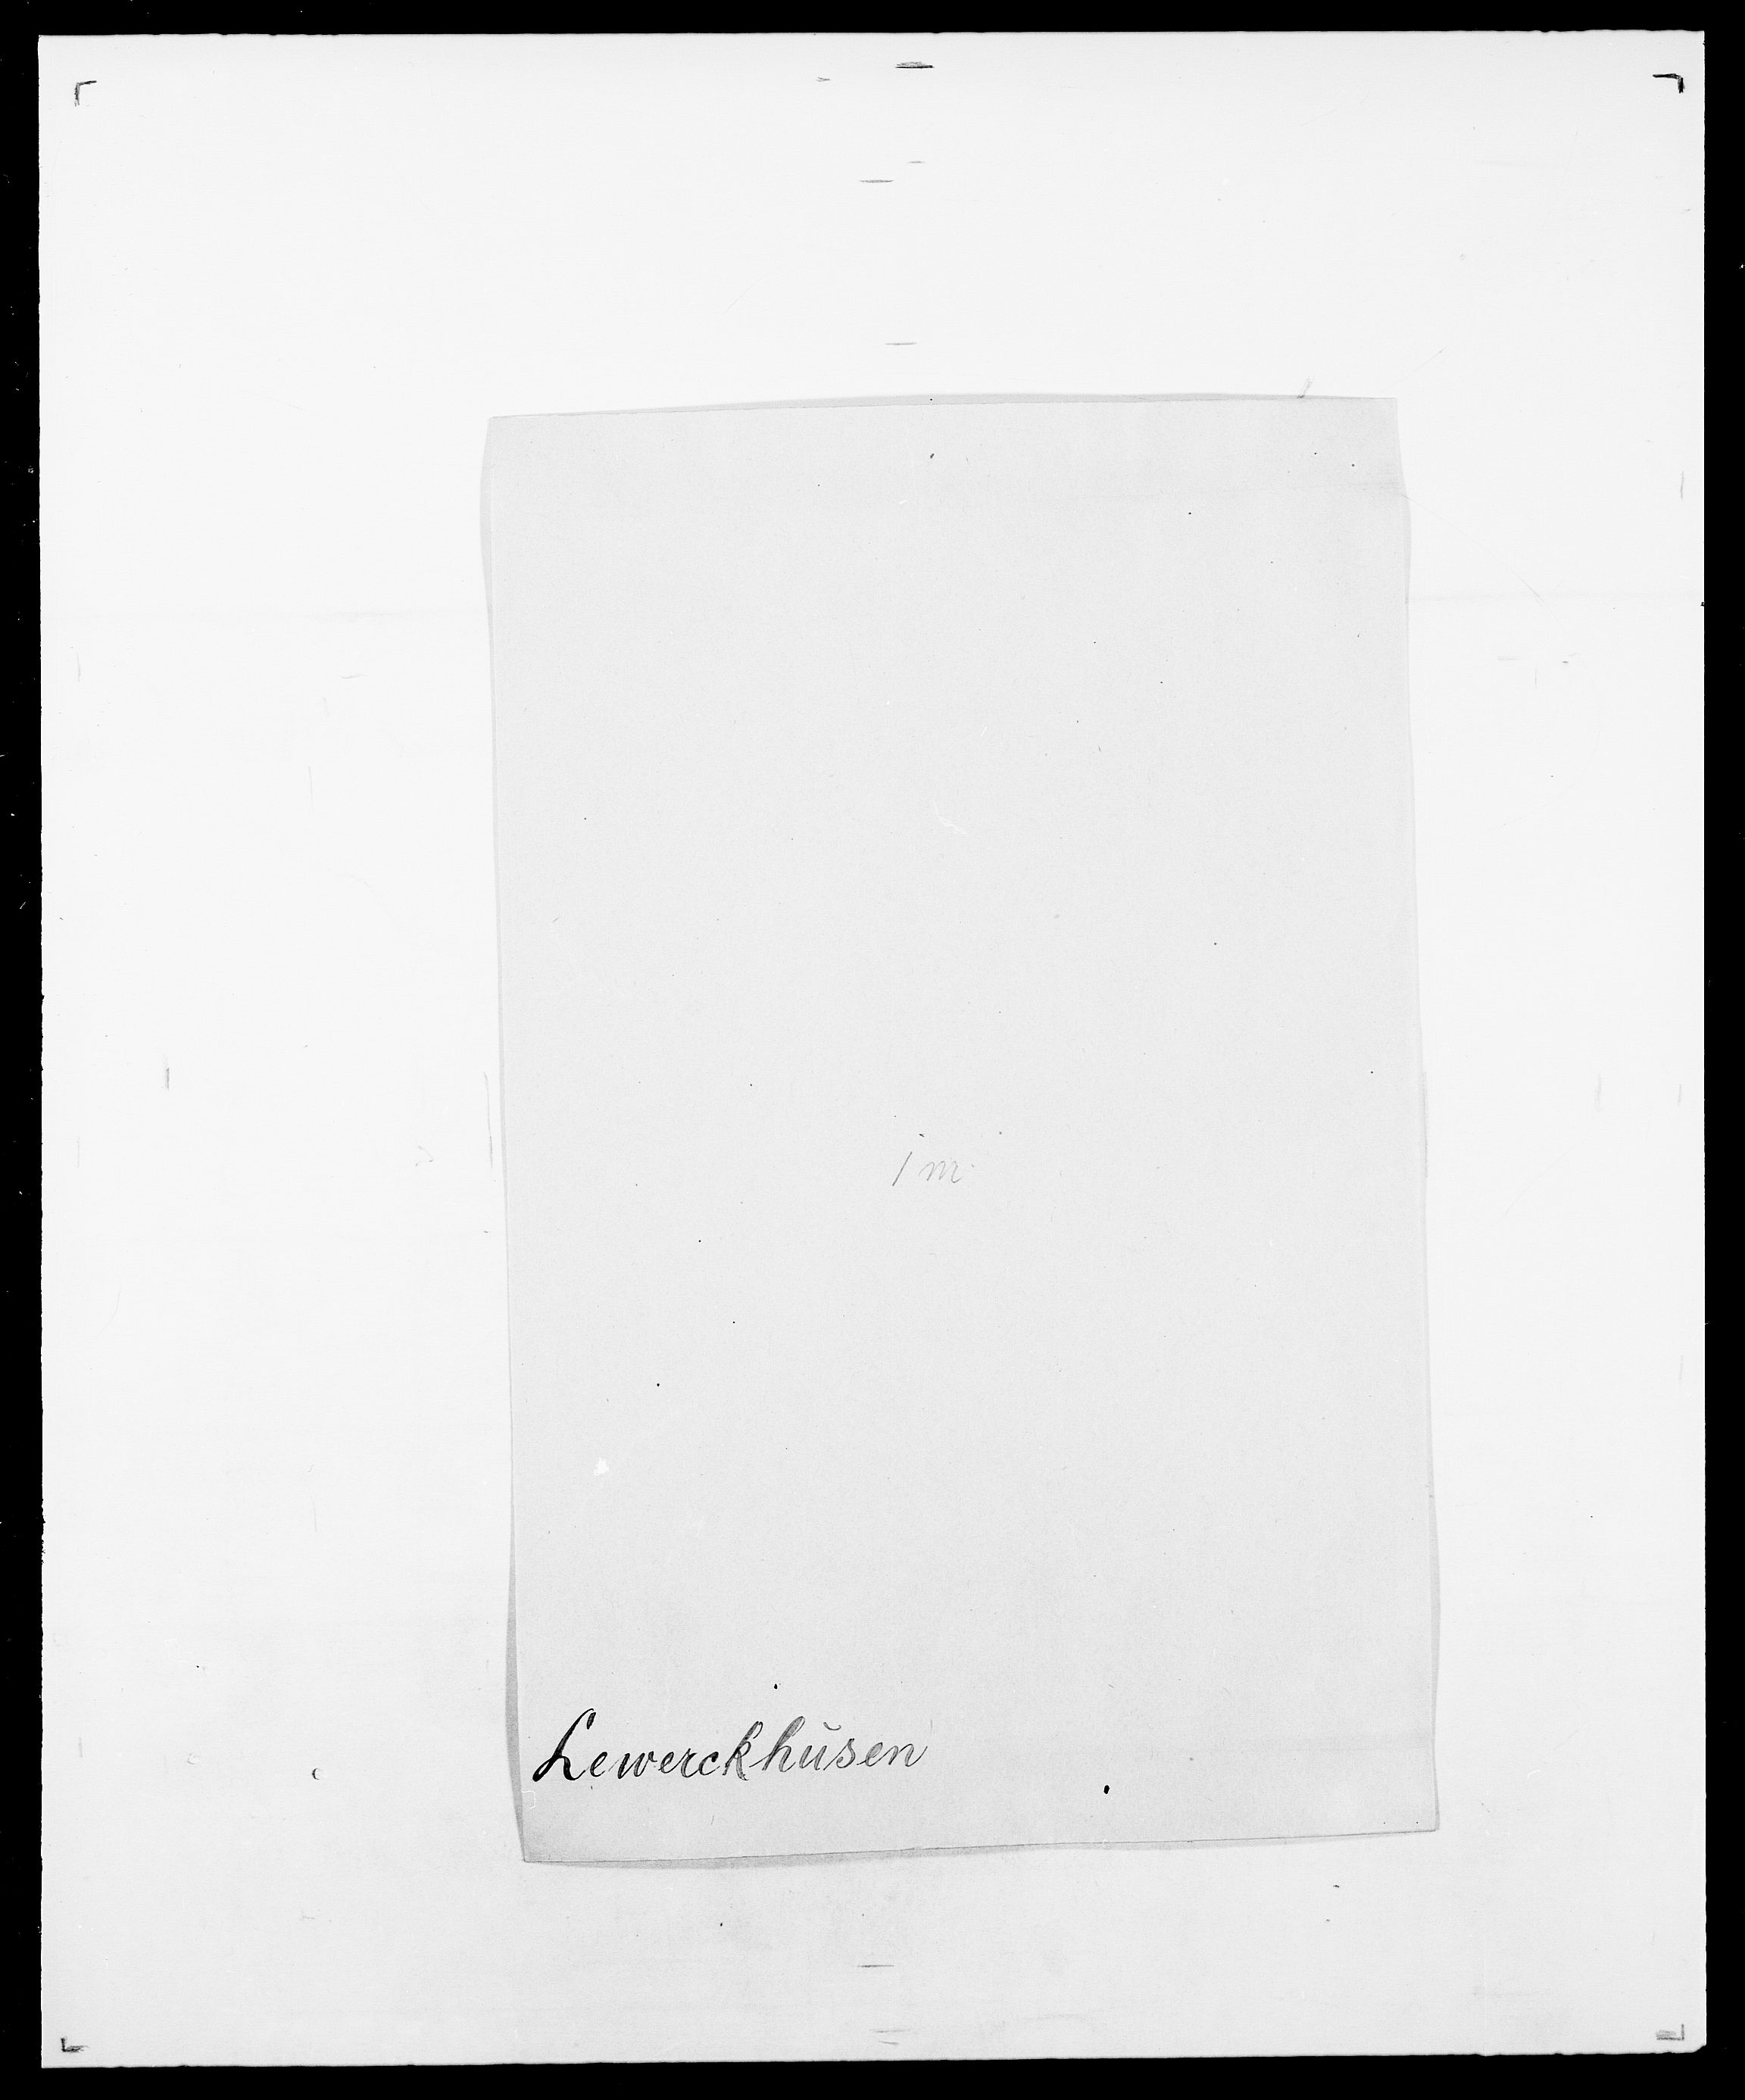 SAO, Delgobe, Charles Antoine - samling, D/Da/L0023: Lau - Lirvyn, s. 300